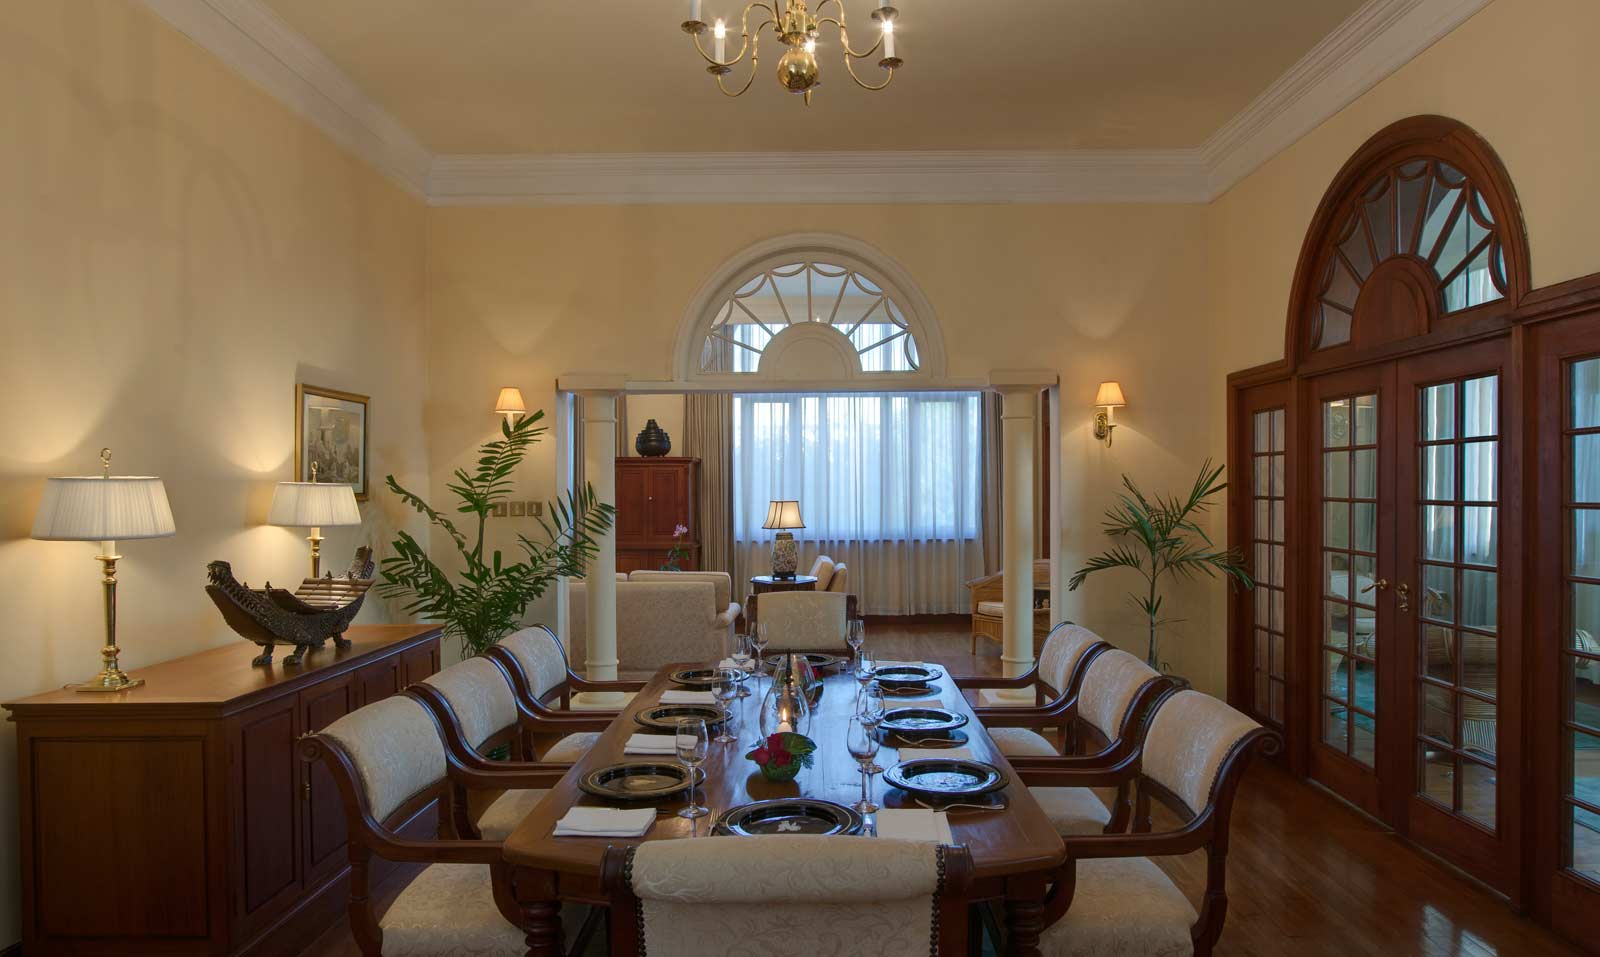 strand hotel yangon » exotic voyages